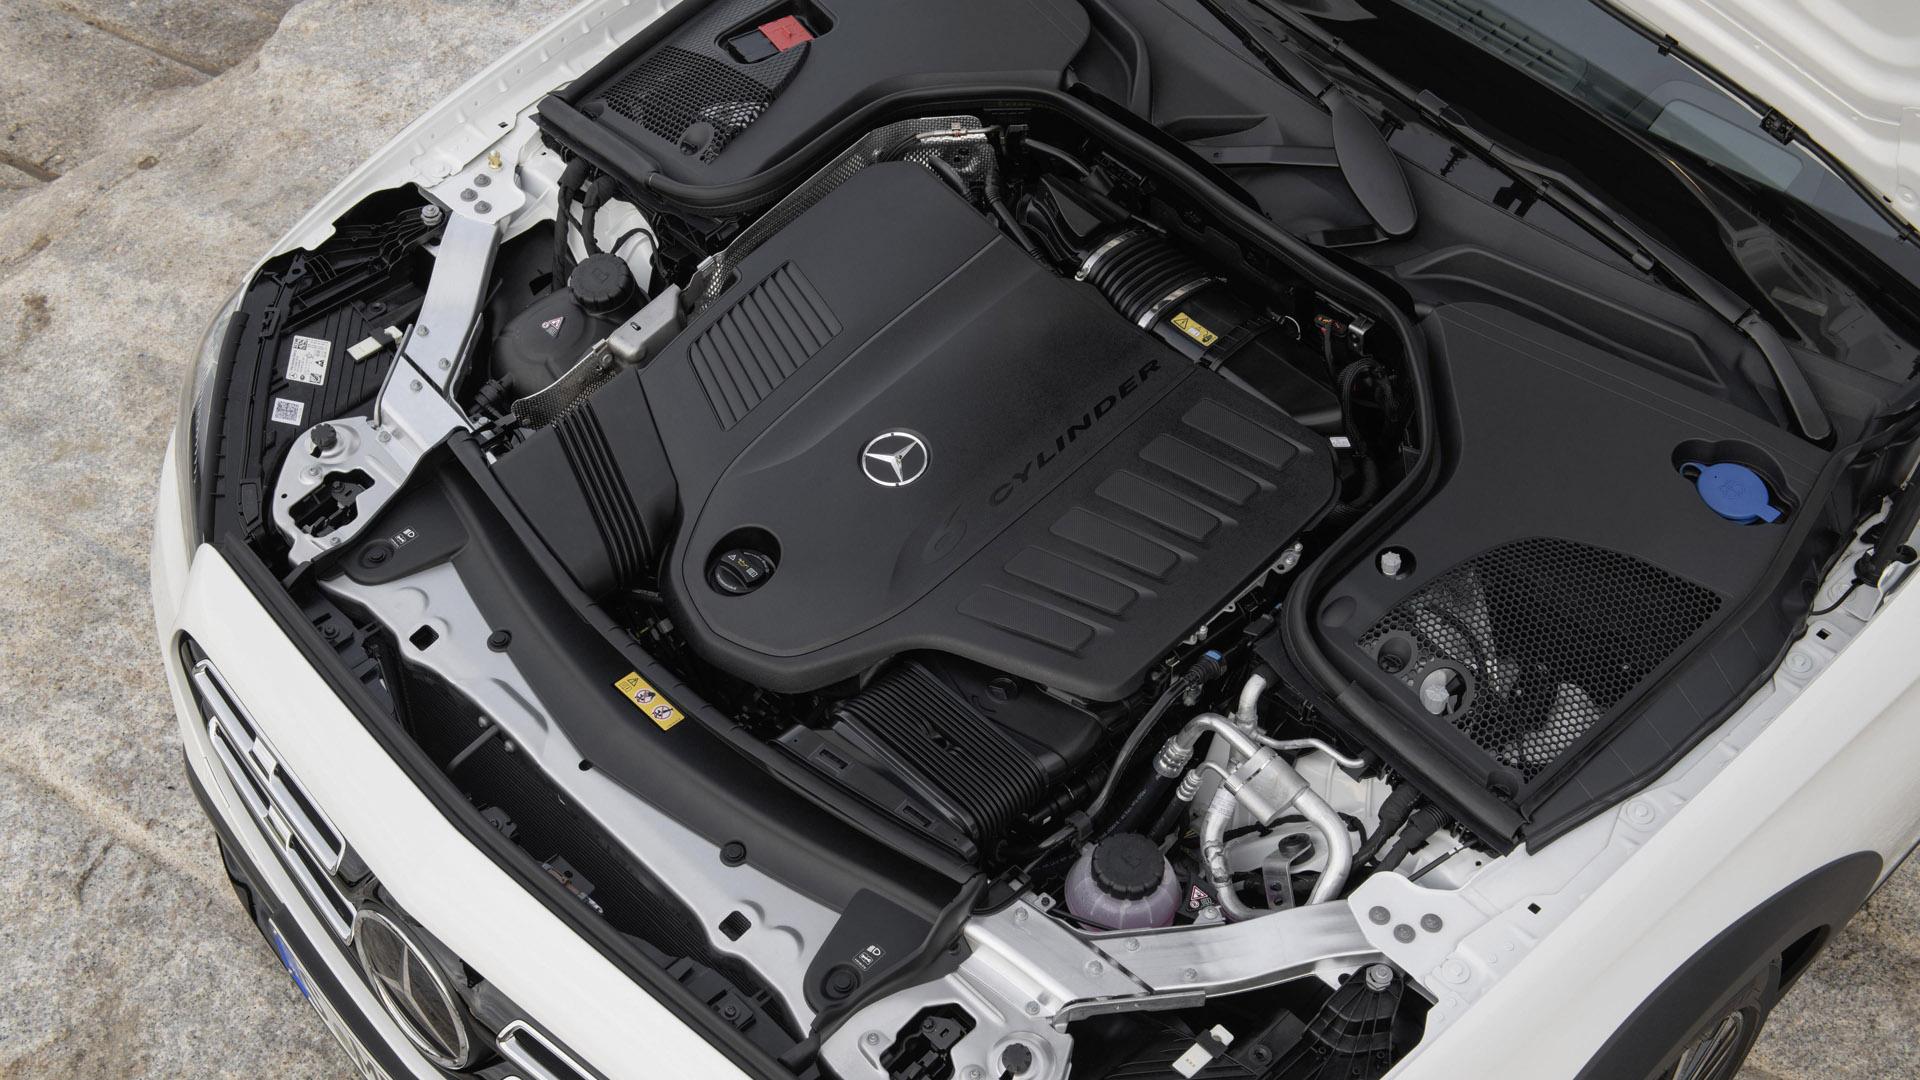 Mercedes-Benz E-Class Estate engine